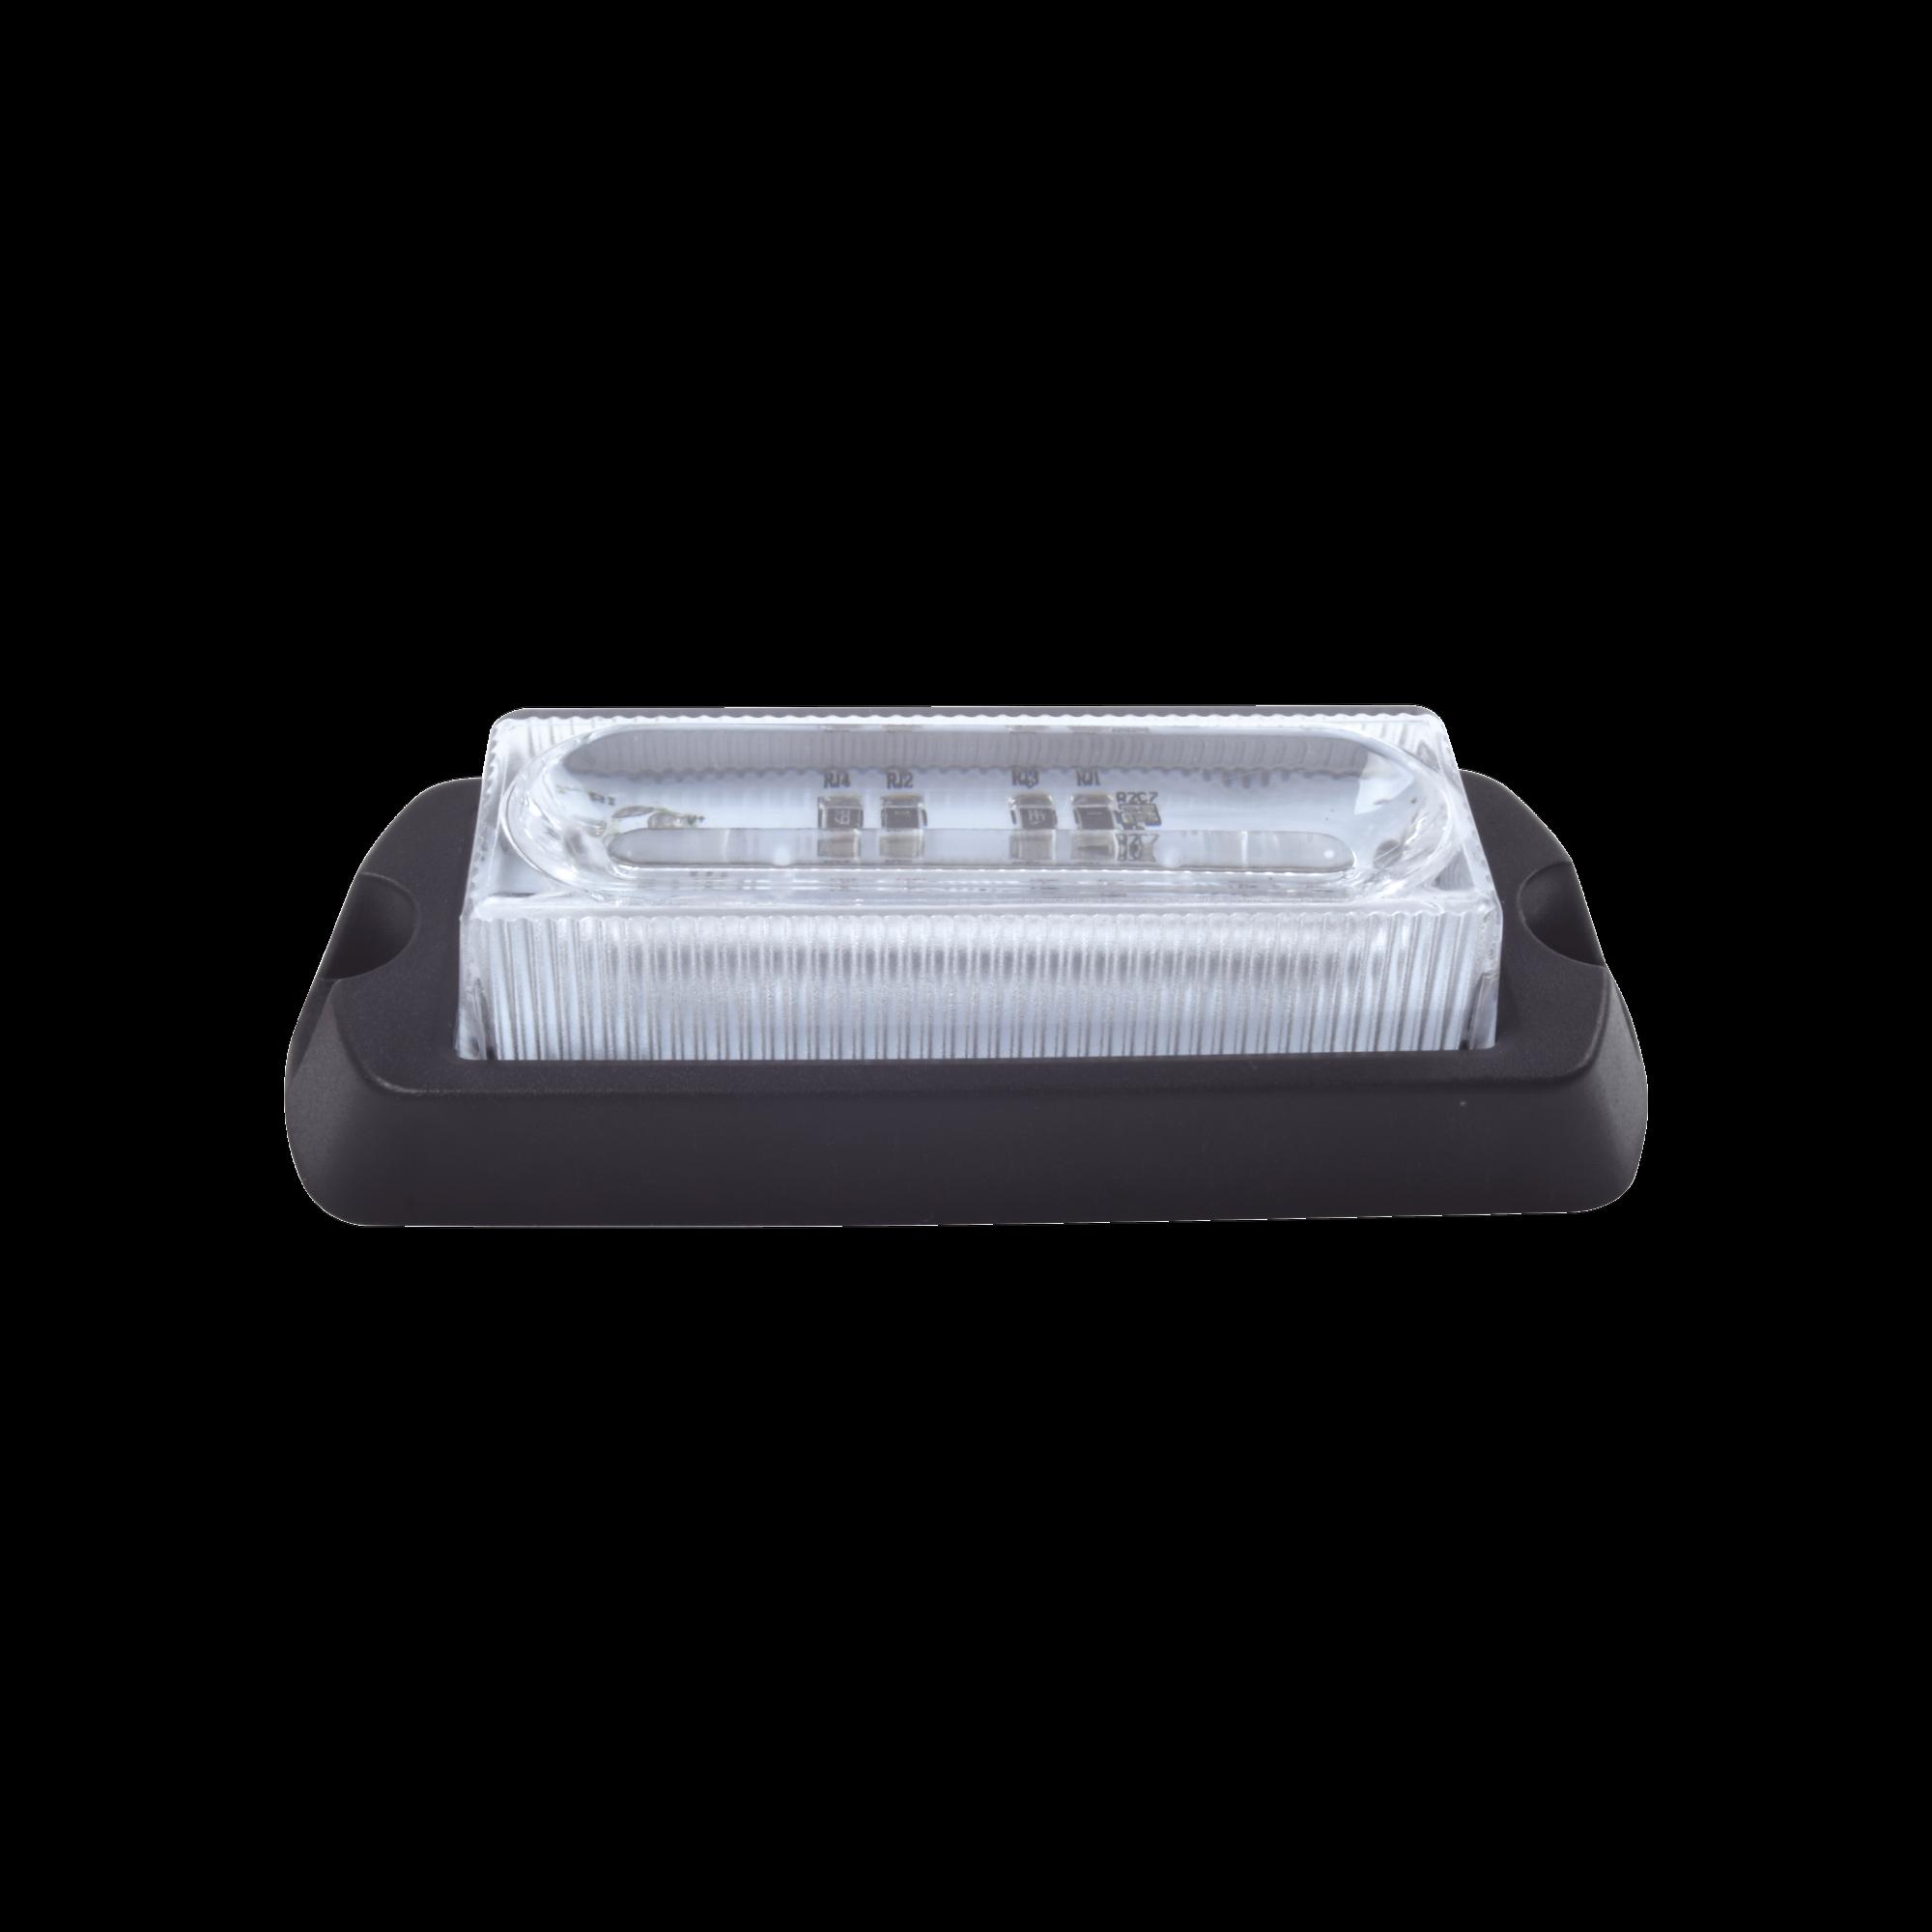 Luz Auxiliar Ultra Brillante X13 de 4 LEDs, color ámbar, con mica transparente.